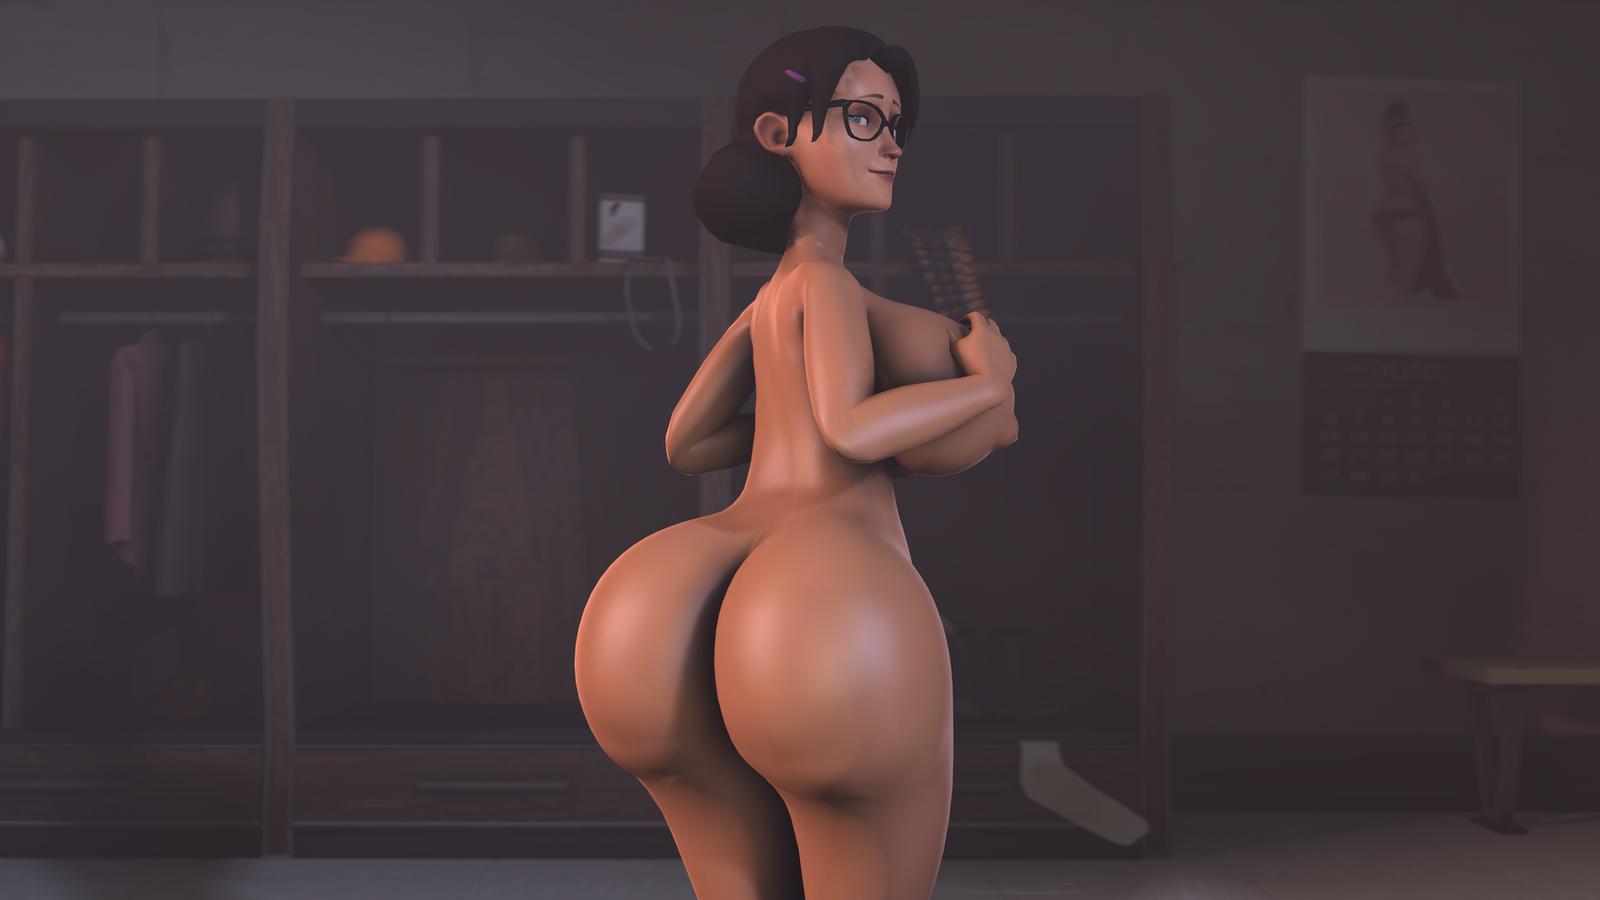 Rockette Naked Miss pauling